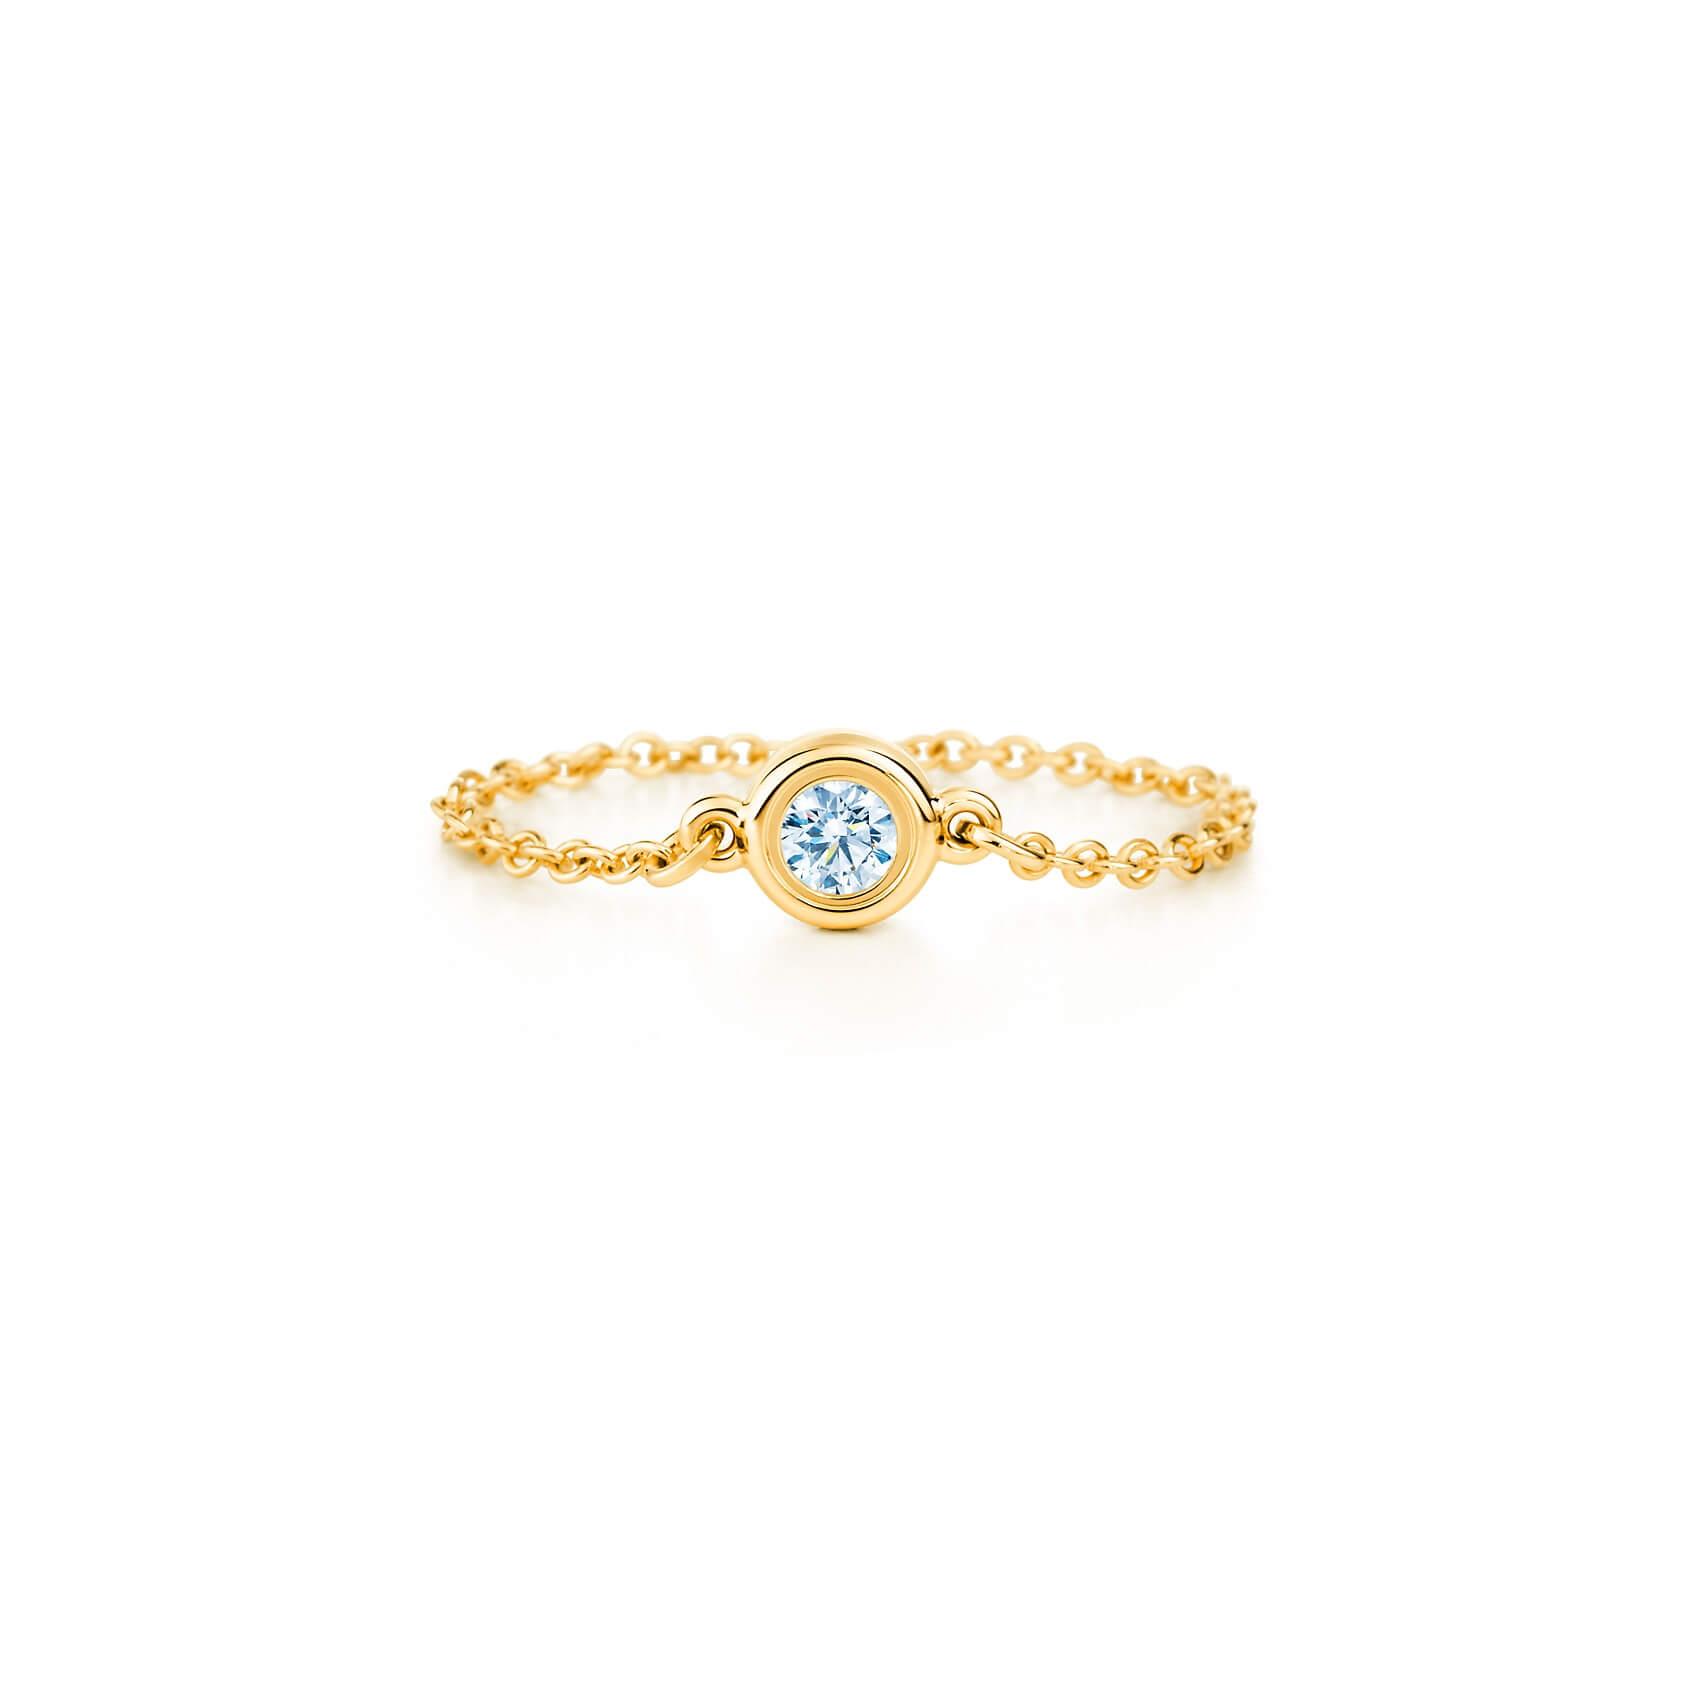 Tiffany & Co_ダイヤモンド バイ ザ ヤード リング_商品写真